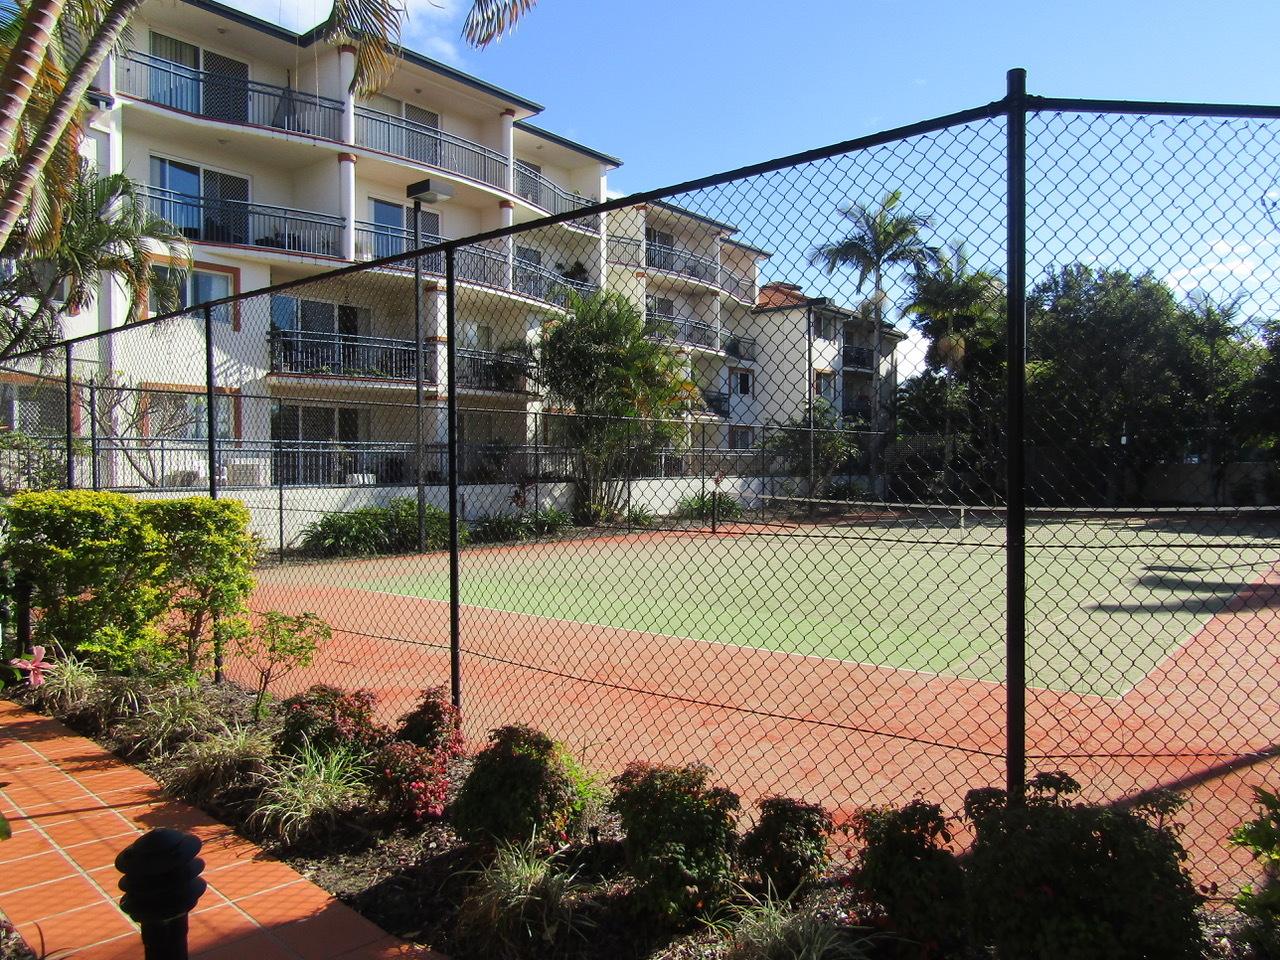 b - Blue Water Bay Apartments